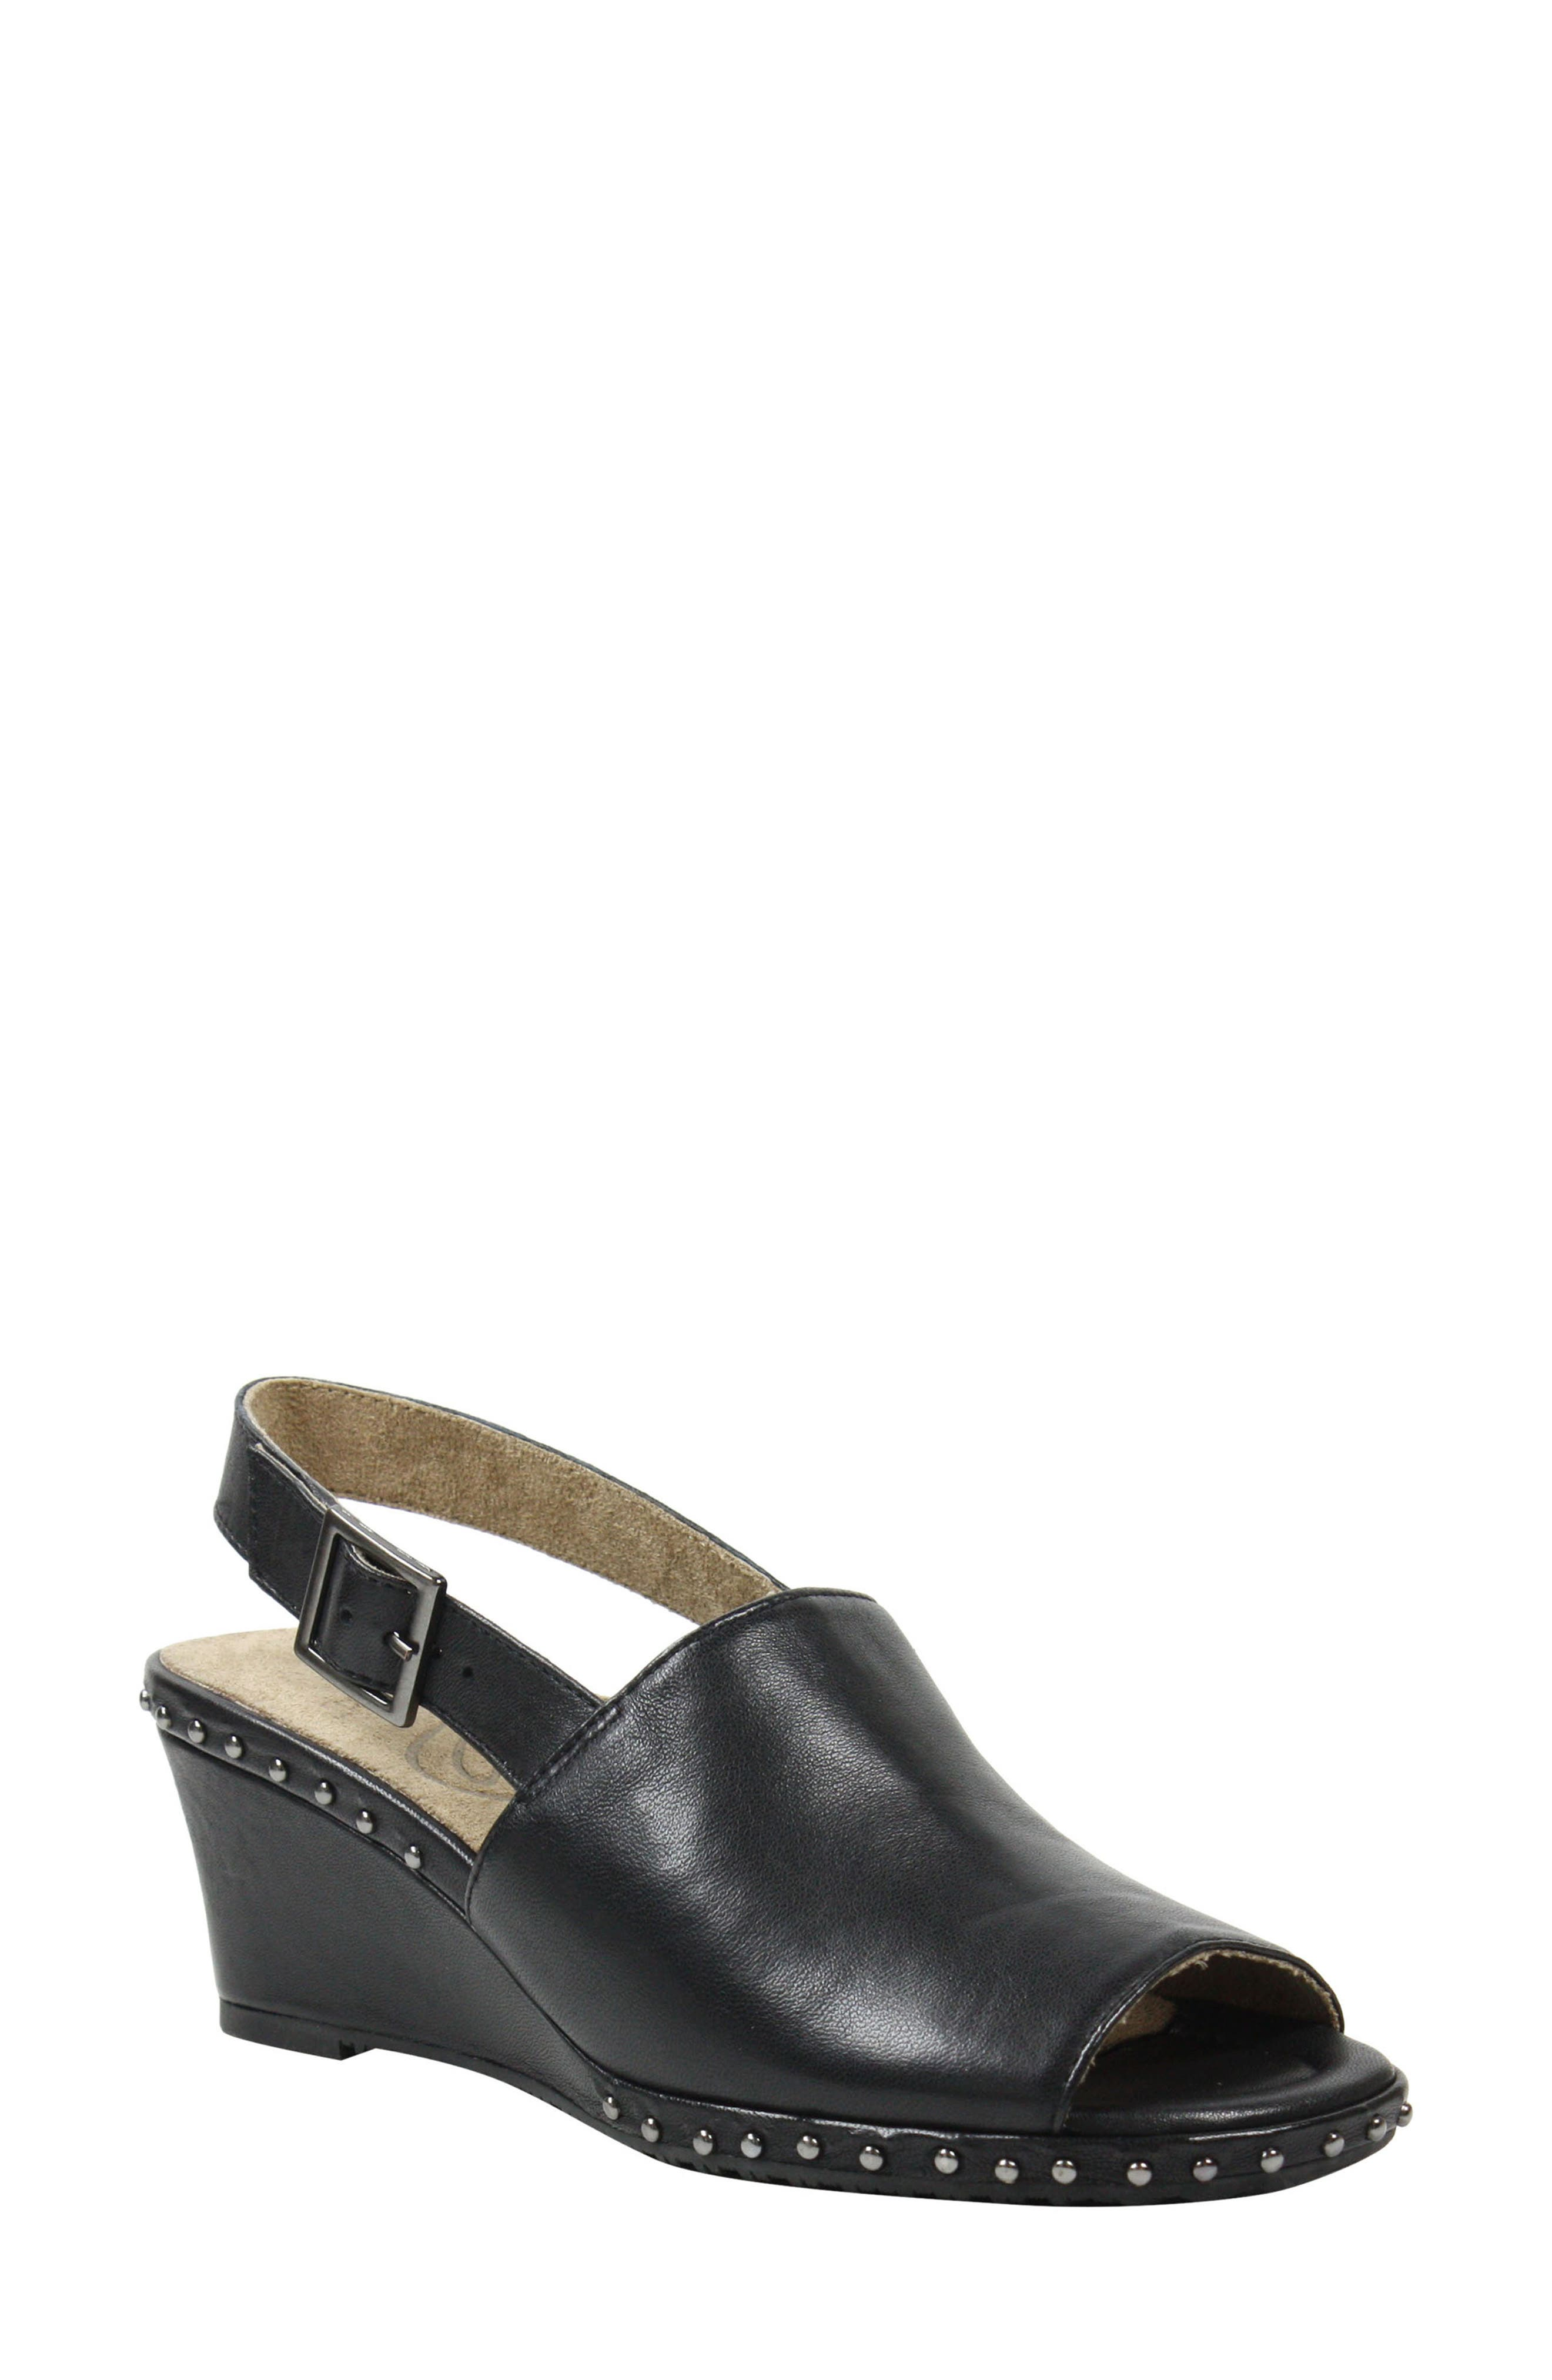 J. Renee Antandra Wedge Sandal, Black